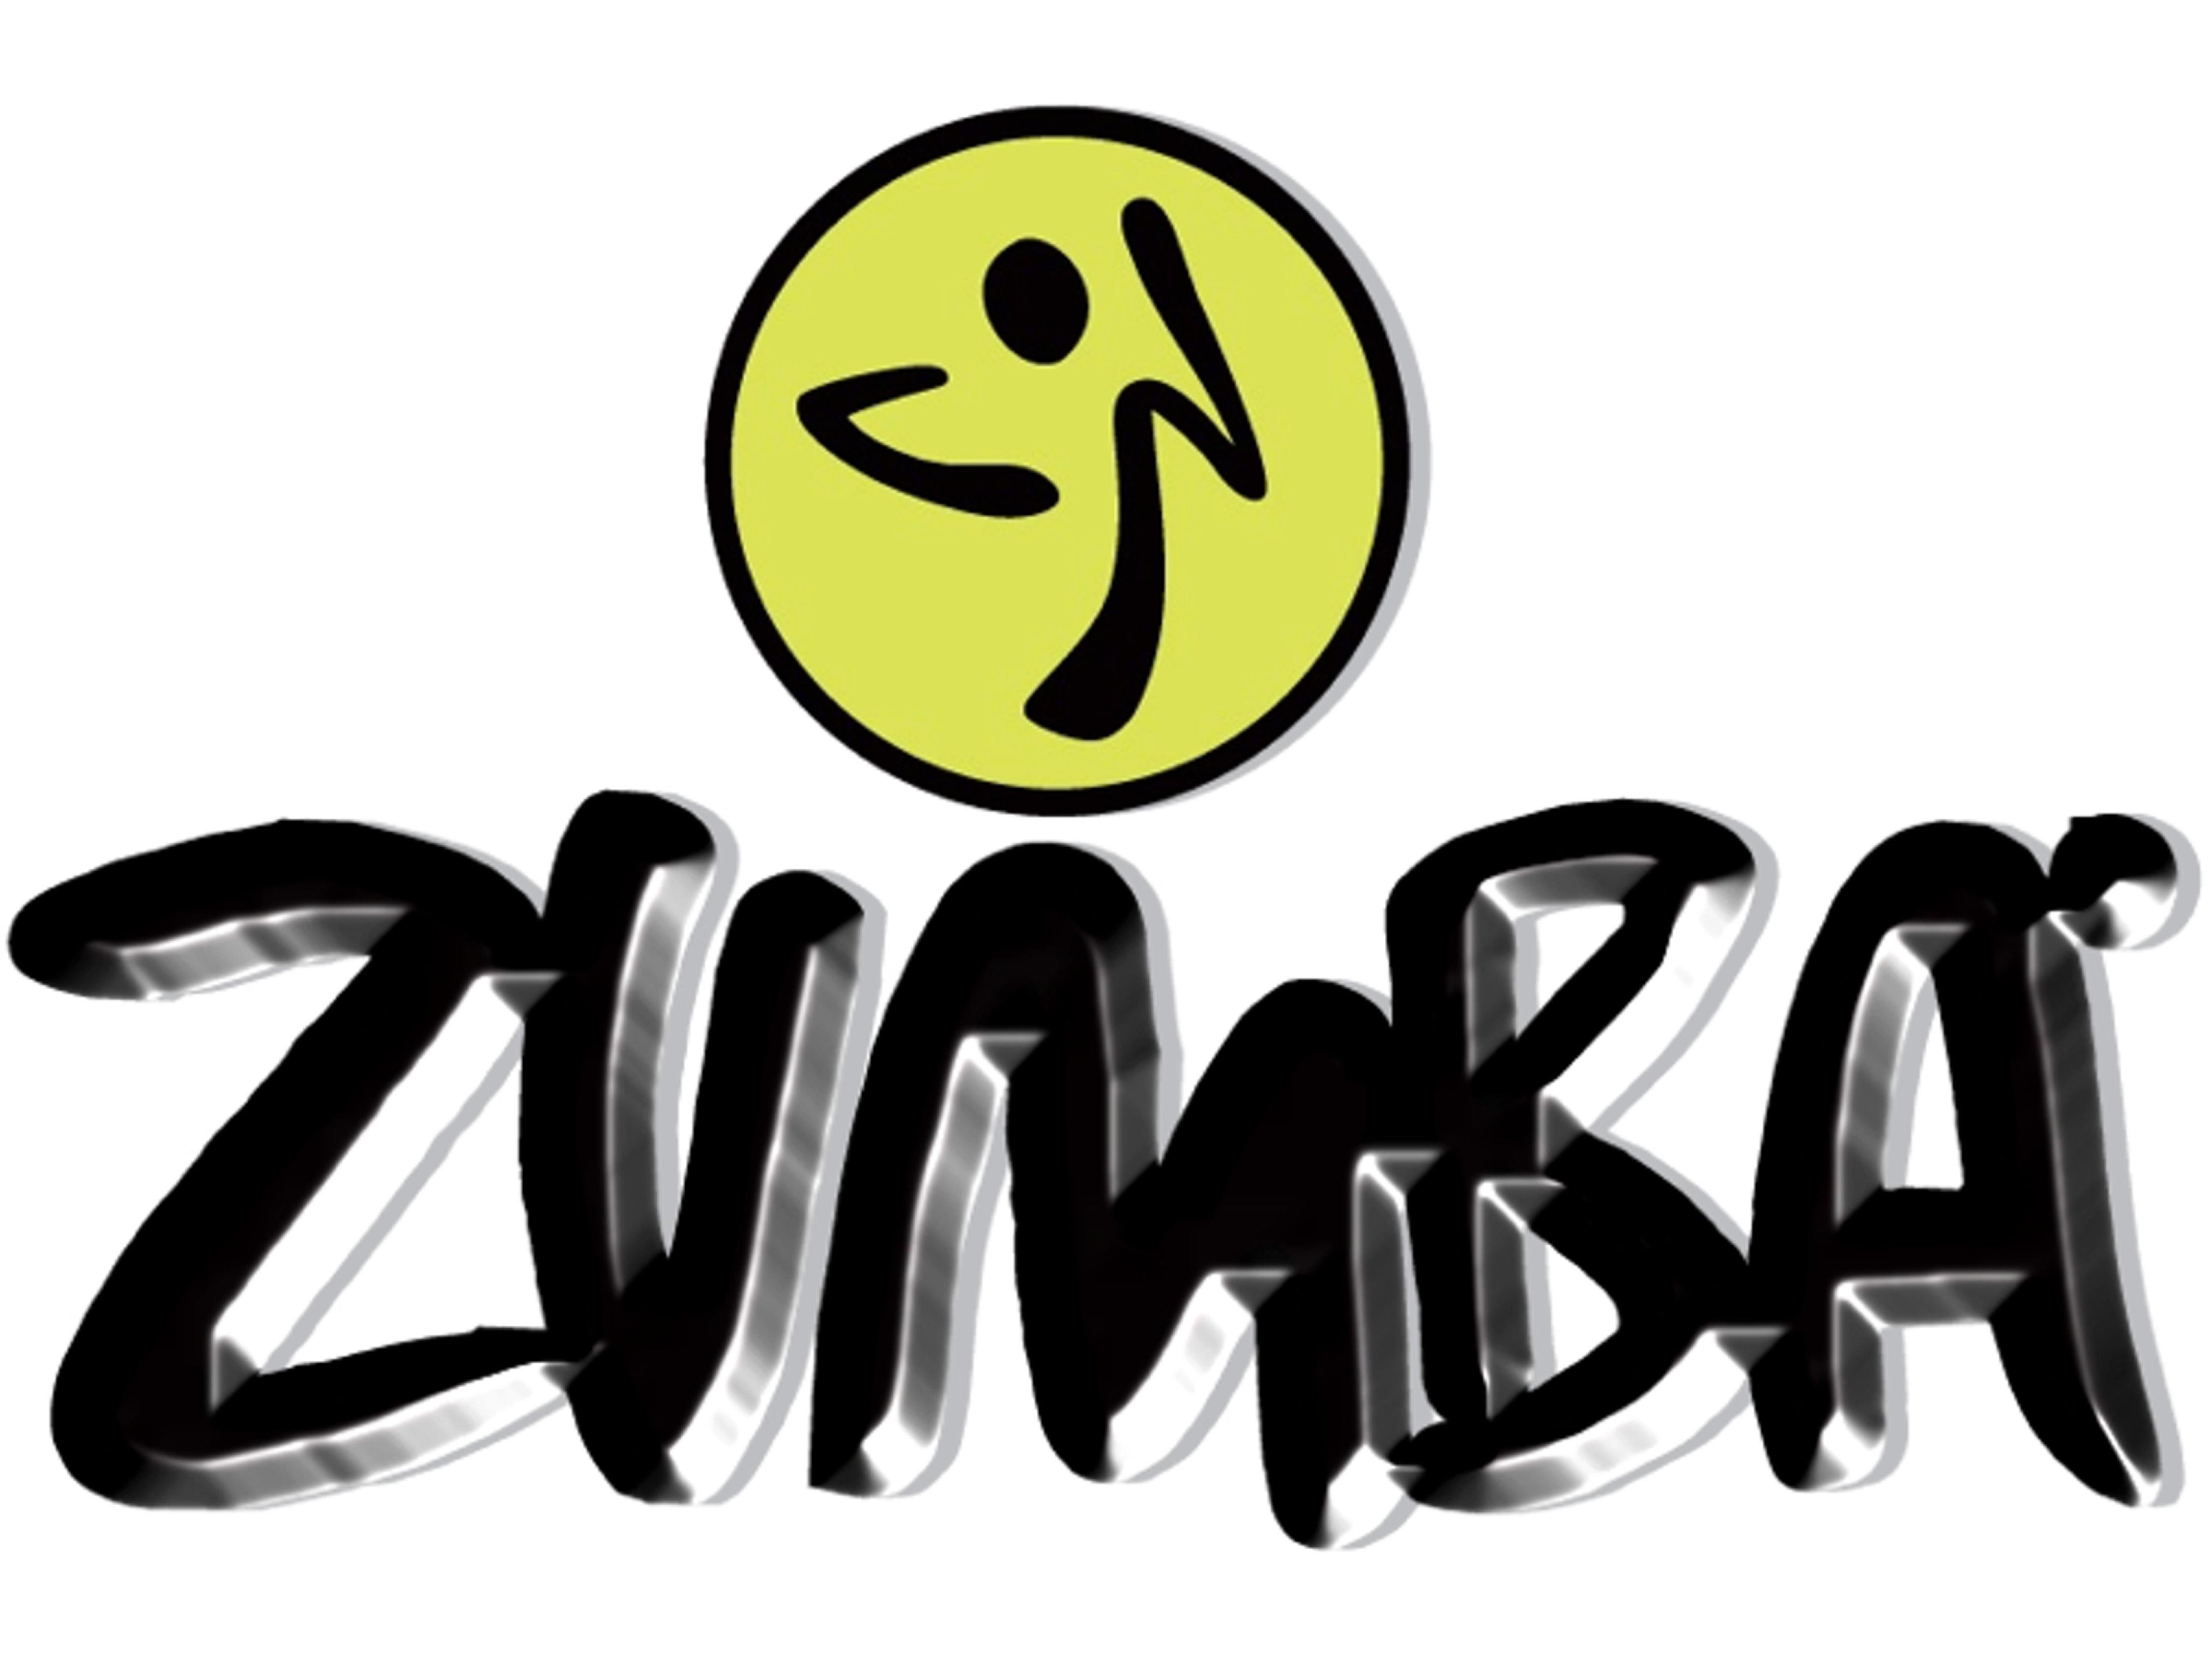 4500x3378 Zumba Clipart